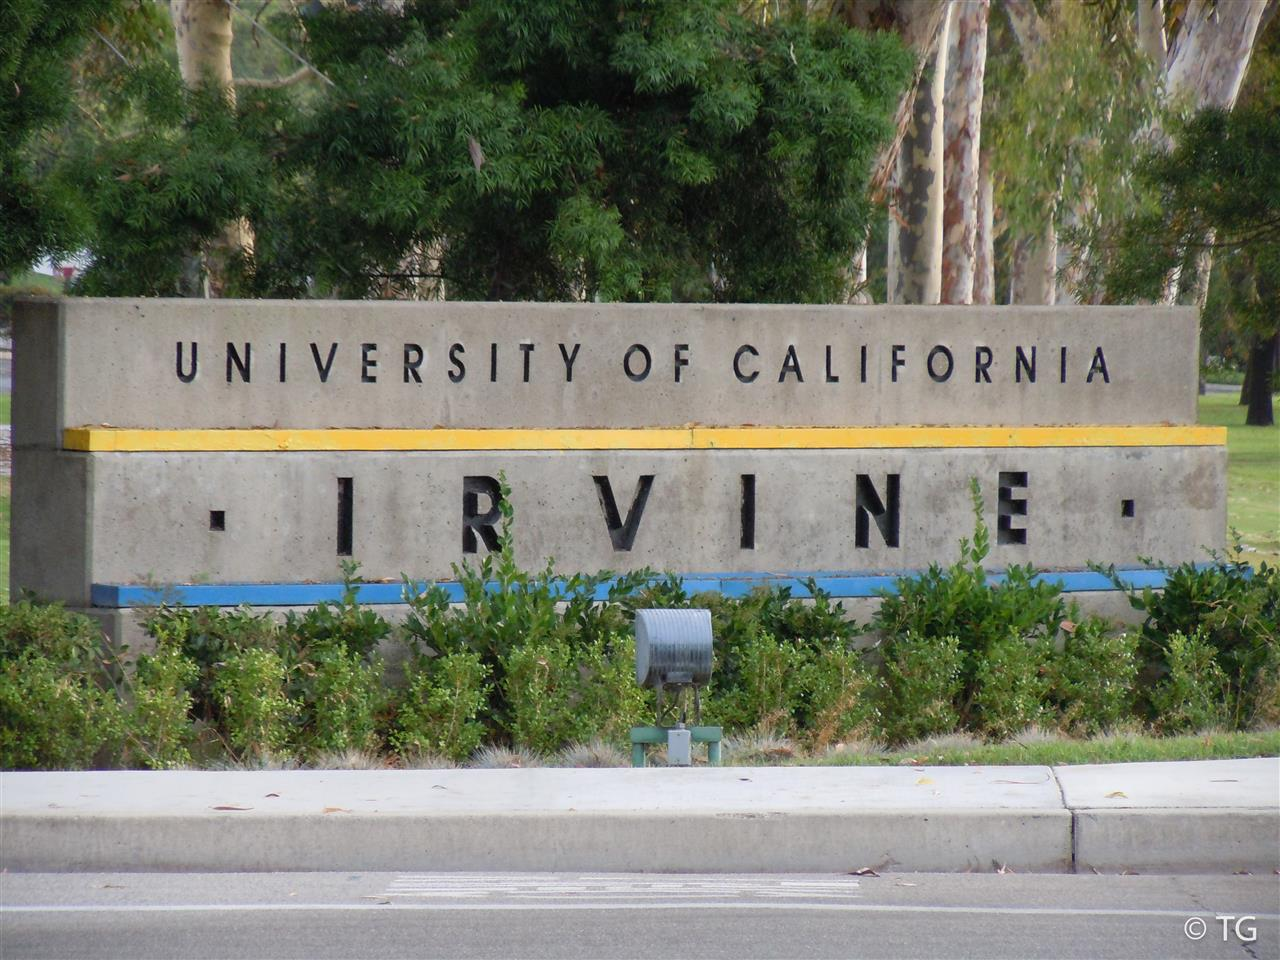 University of California Irvine Irvine California